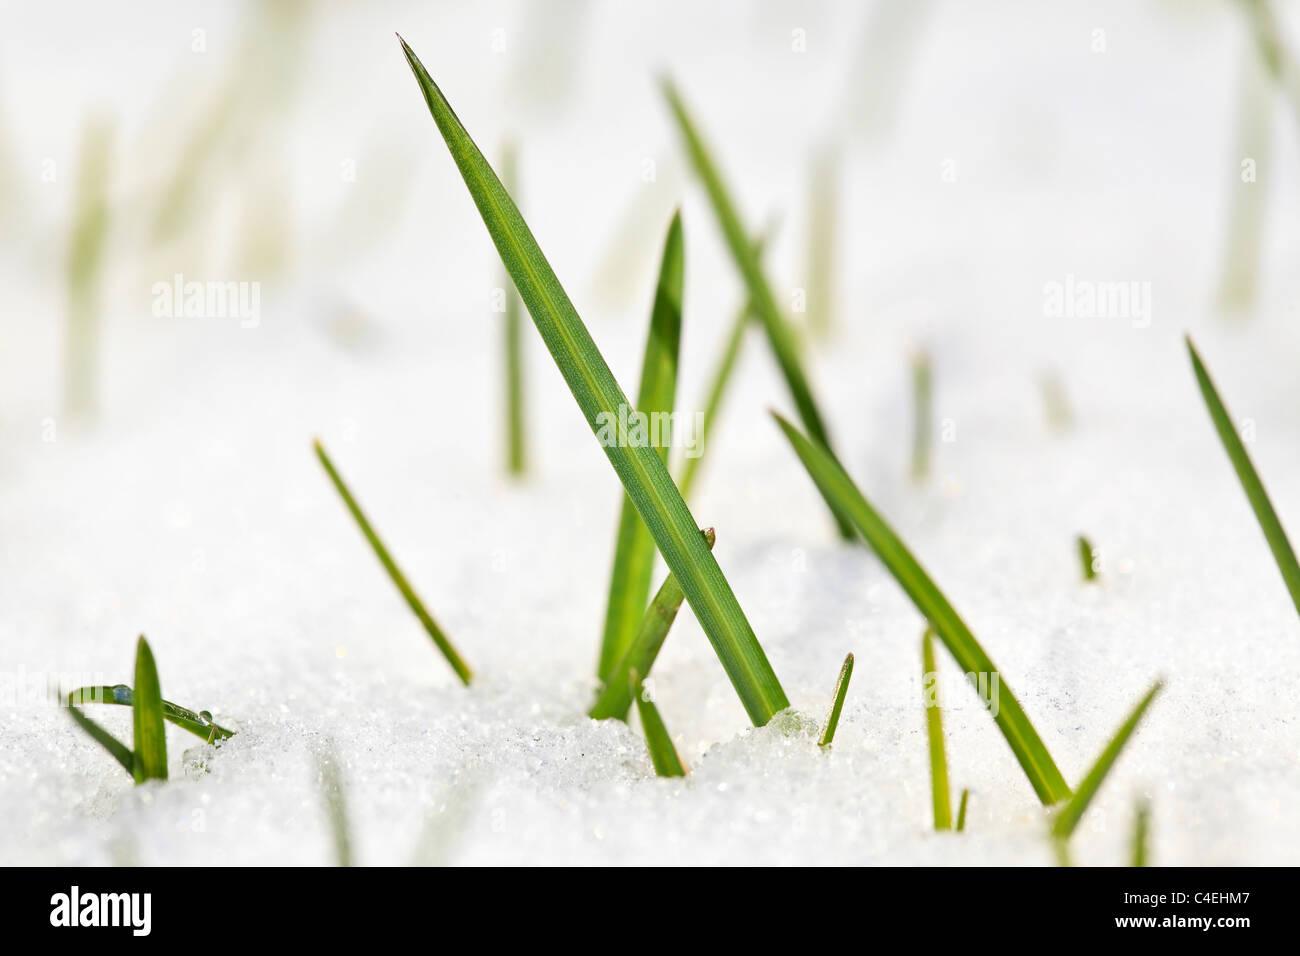 Blades of grass in snow, close up. Winnipeg, Manitoba, Canada. - Stock Image